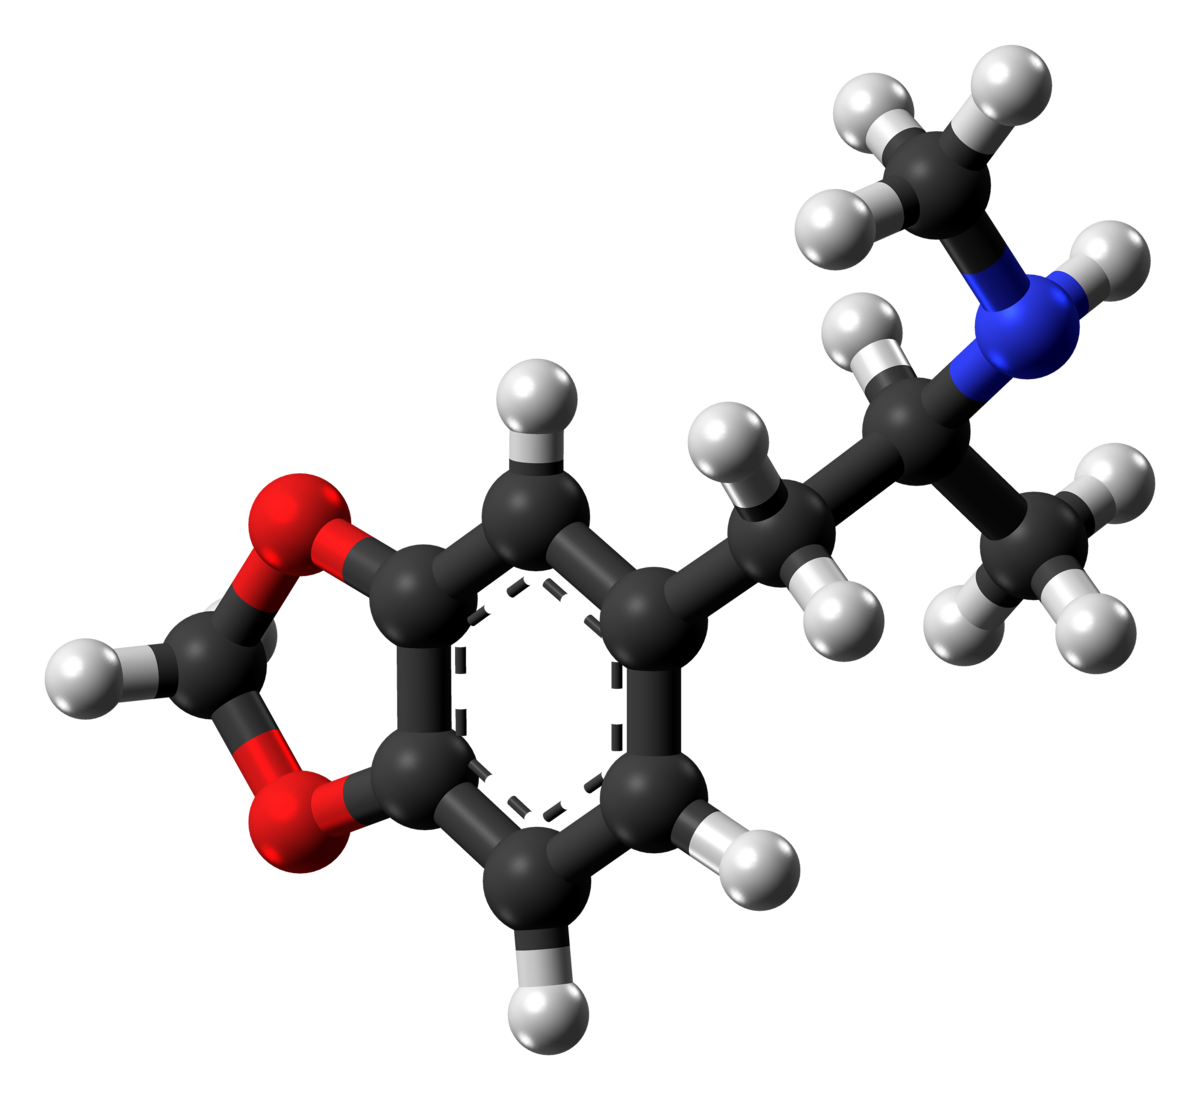 Mdma wikipedia . Medication clipart illegal drug